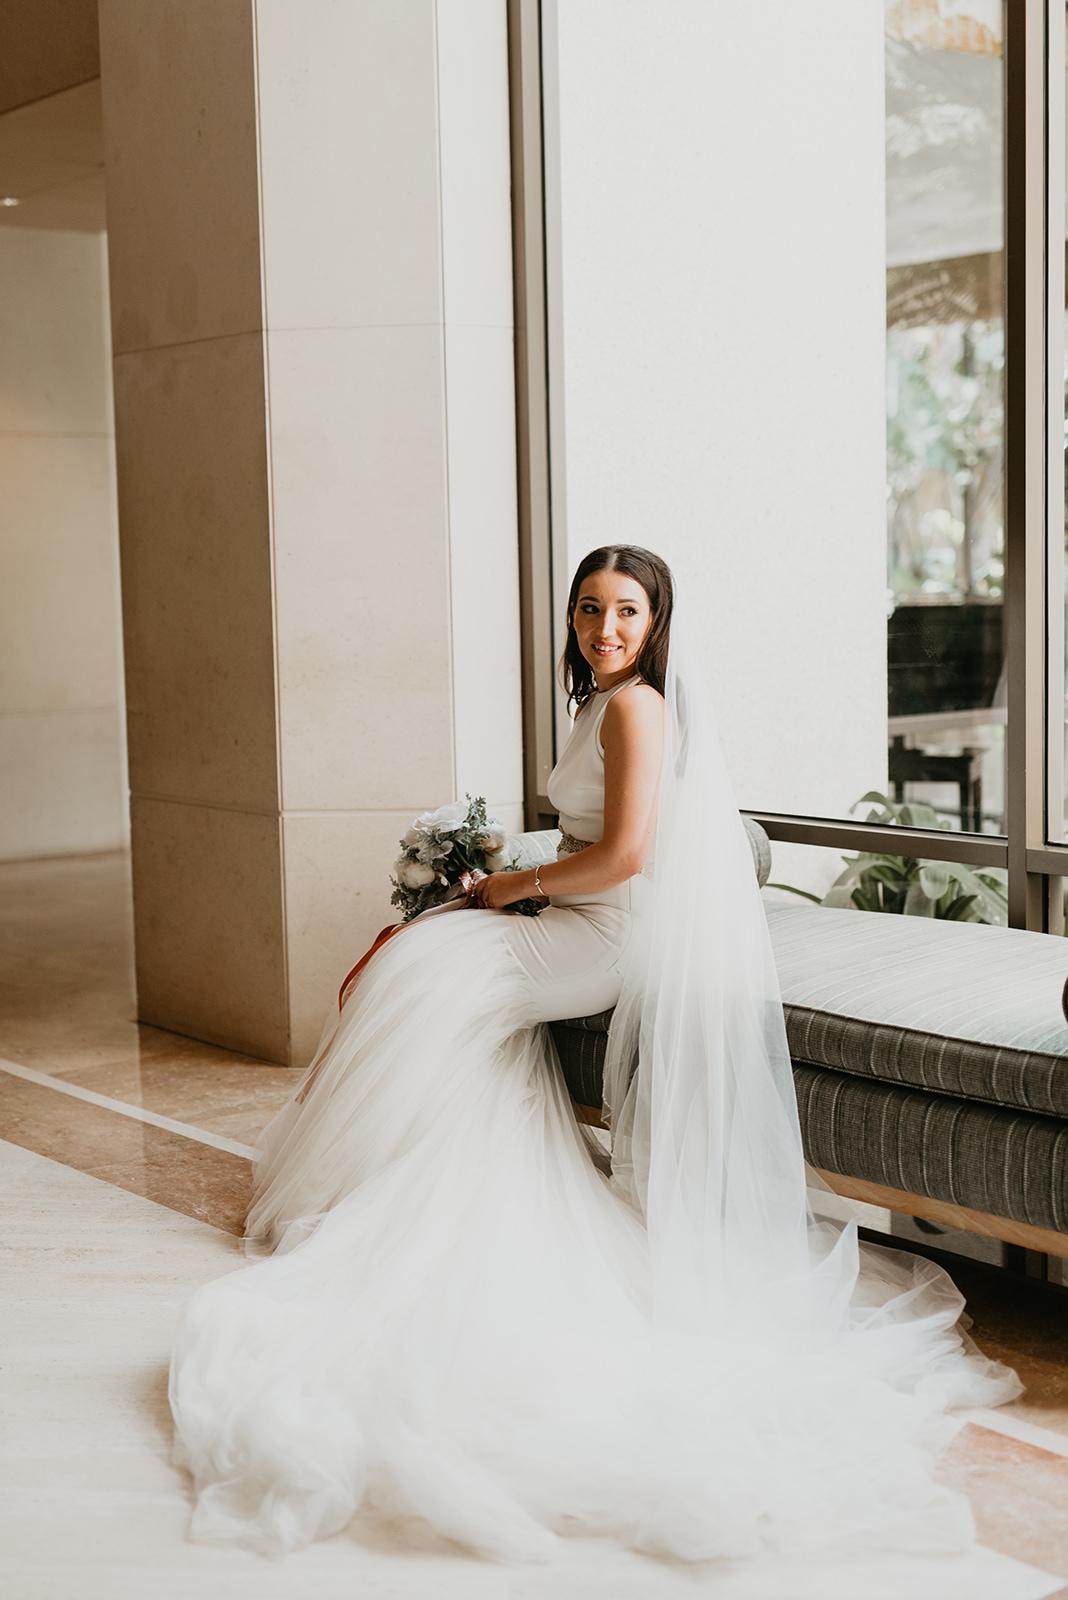 Fashion Valley Wedding - Bride